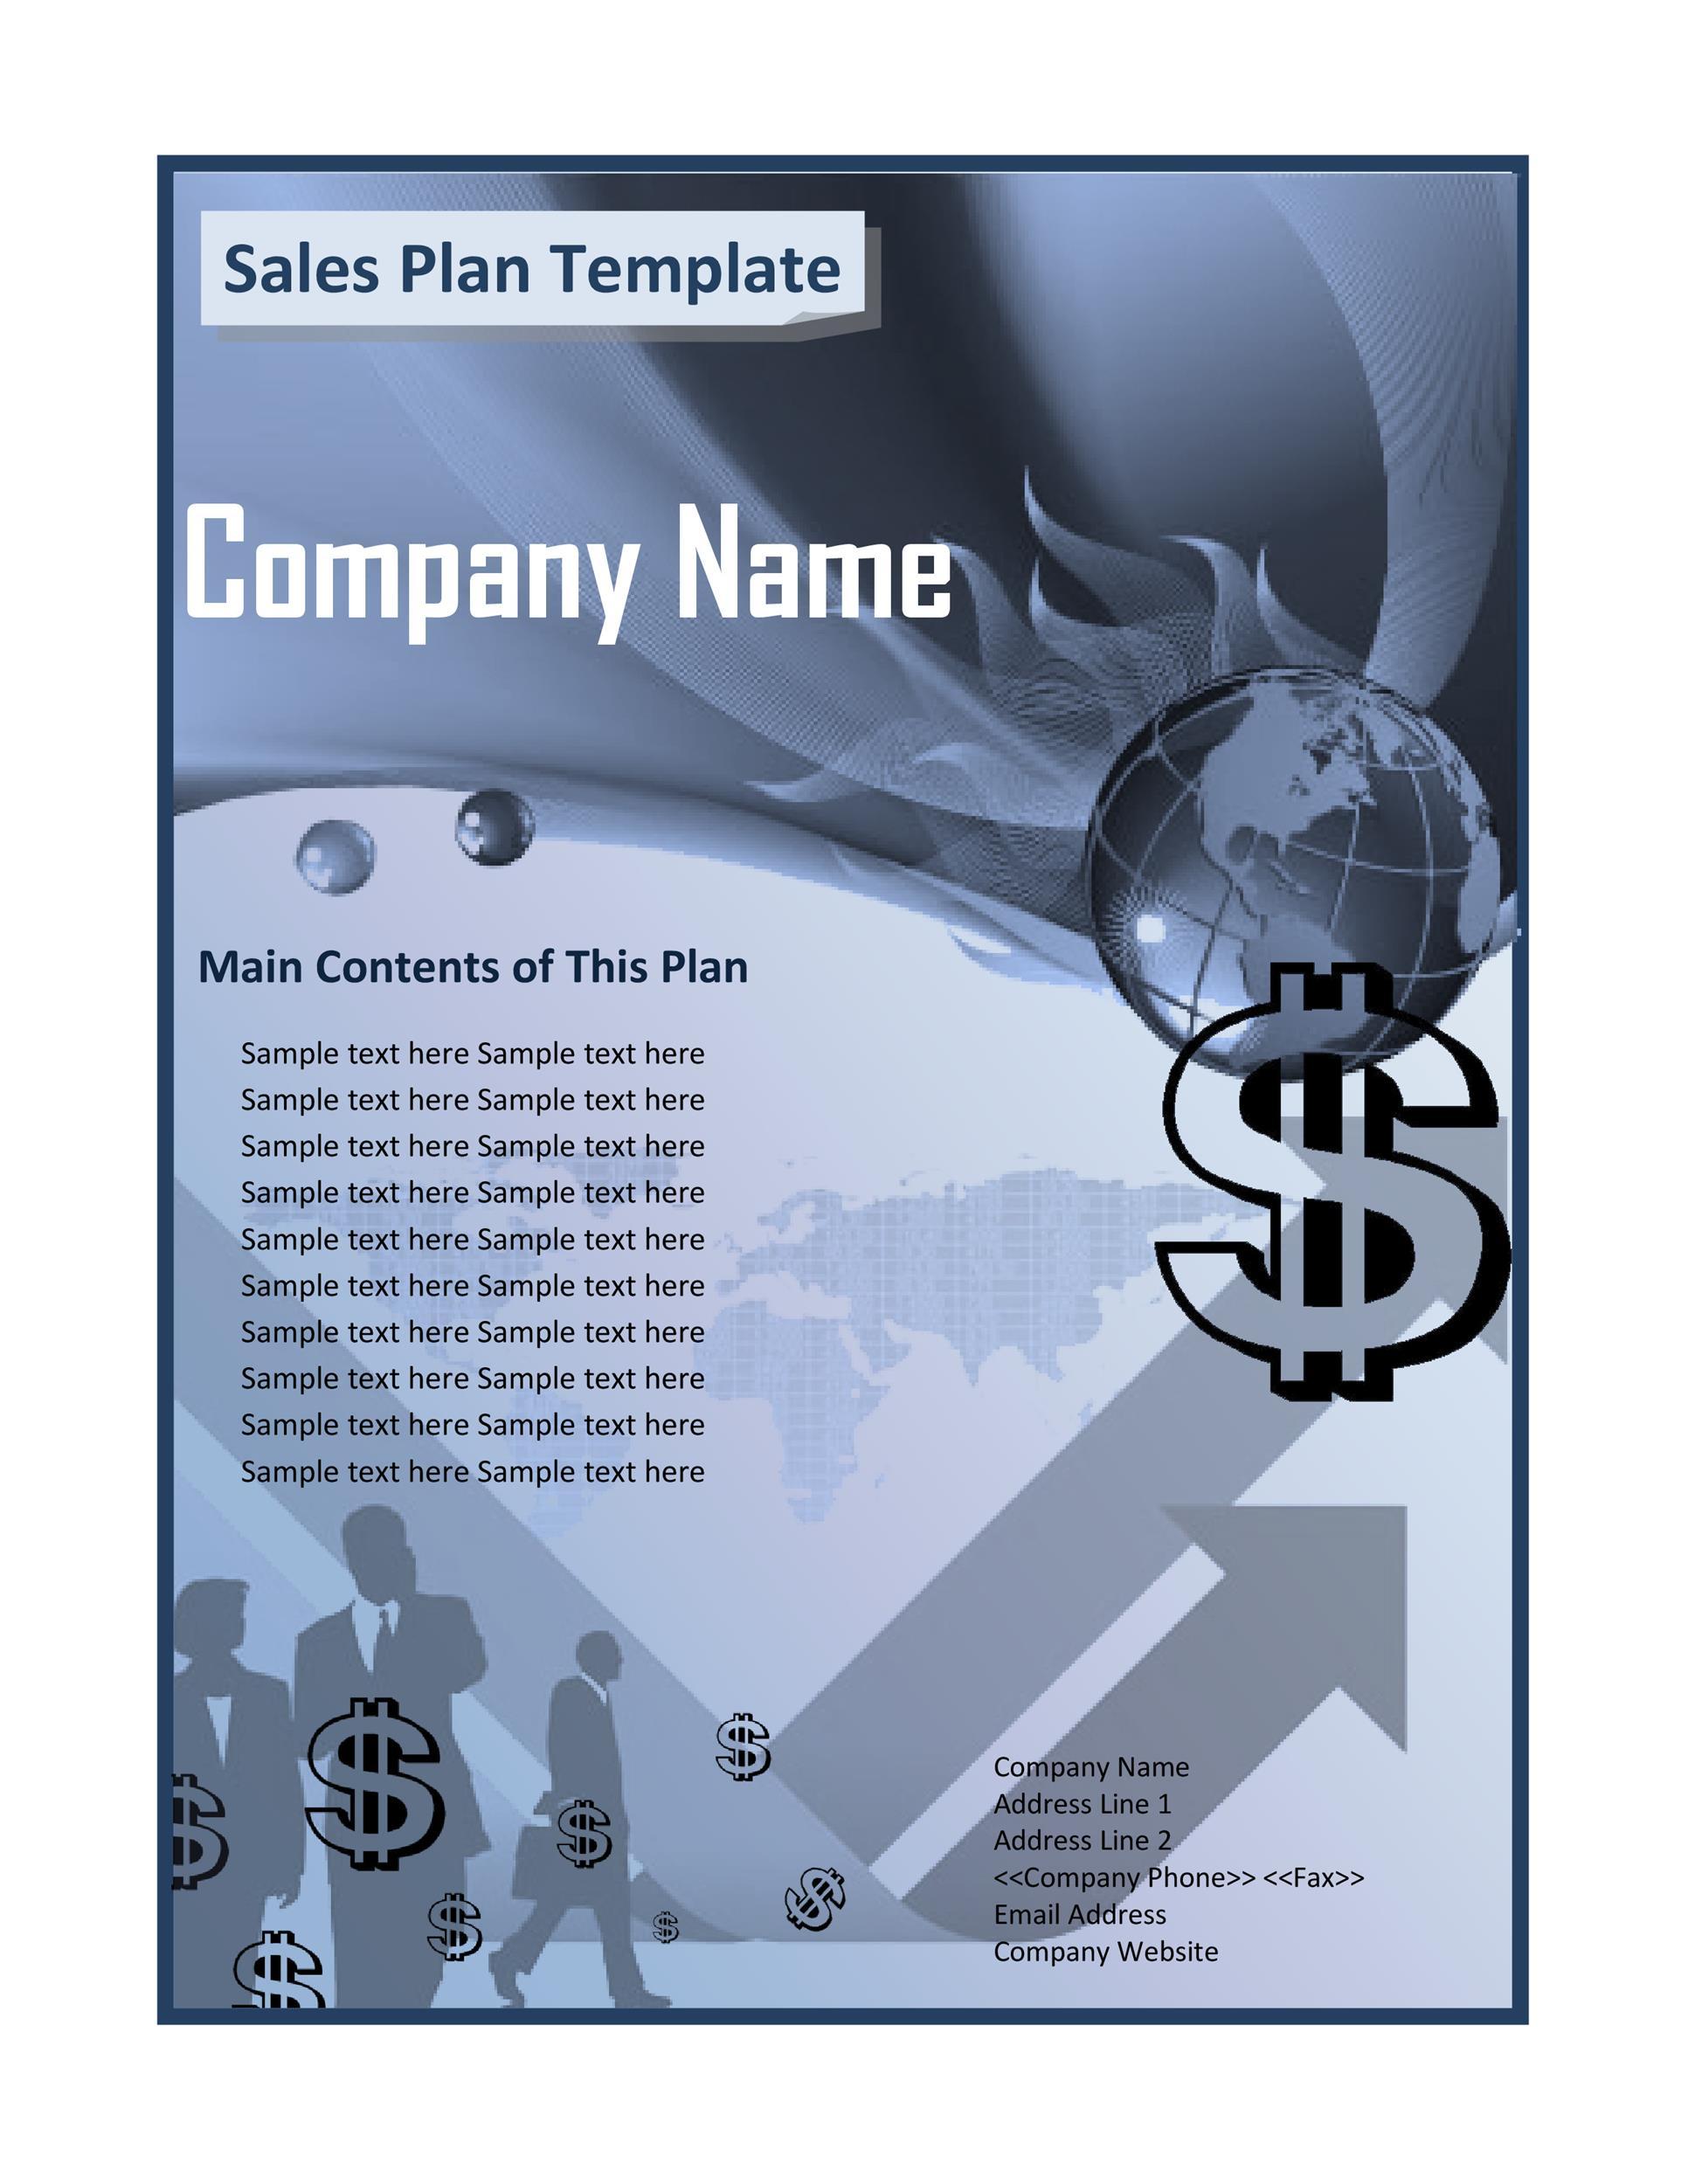 Free Sales Plan Template 21